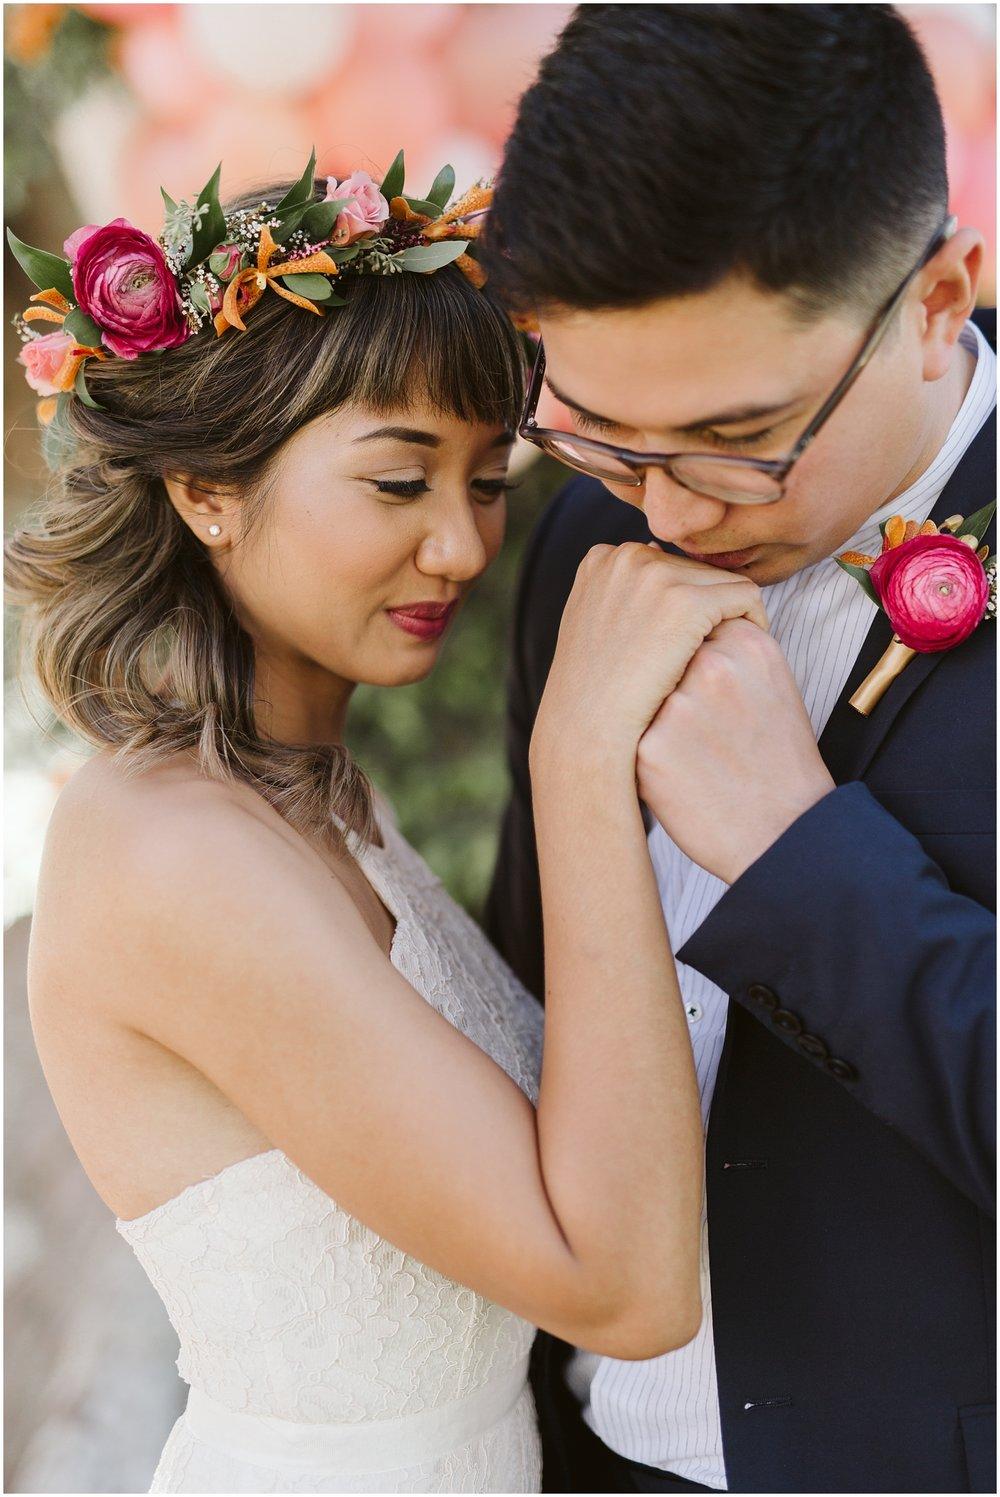 Dillingham Ranch Wedding, Tropical Hawaii Wedding Ceremony, Oahu Hawaii Wedding Ceremony, Hawaii Elopement